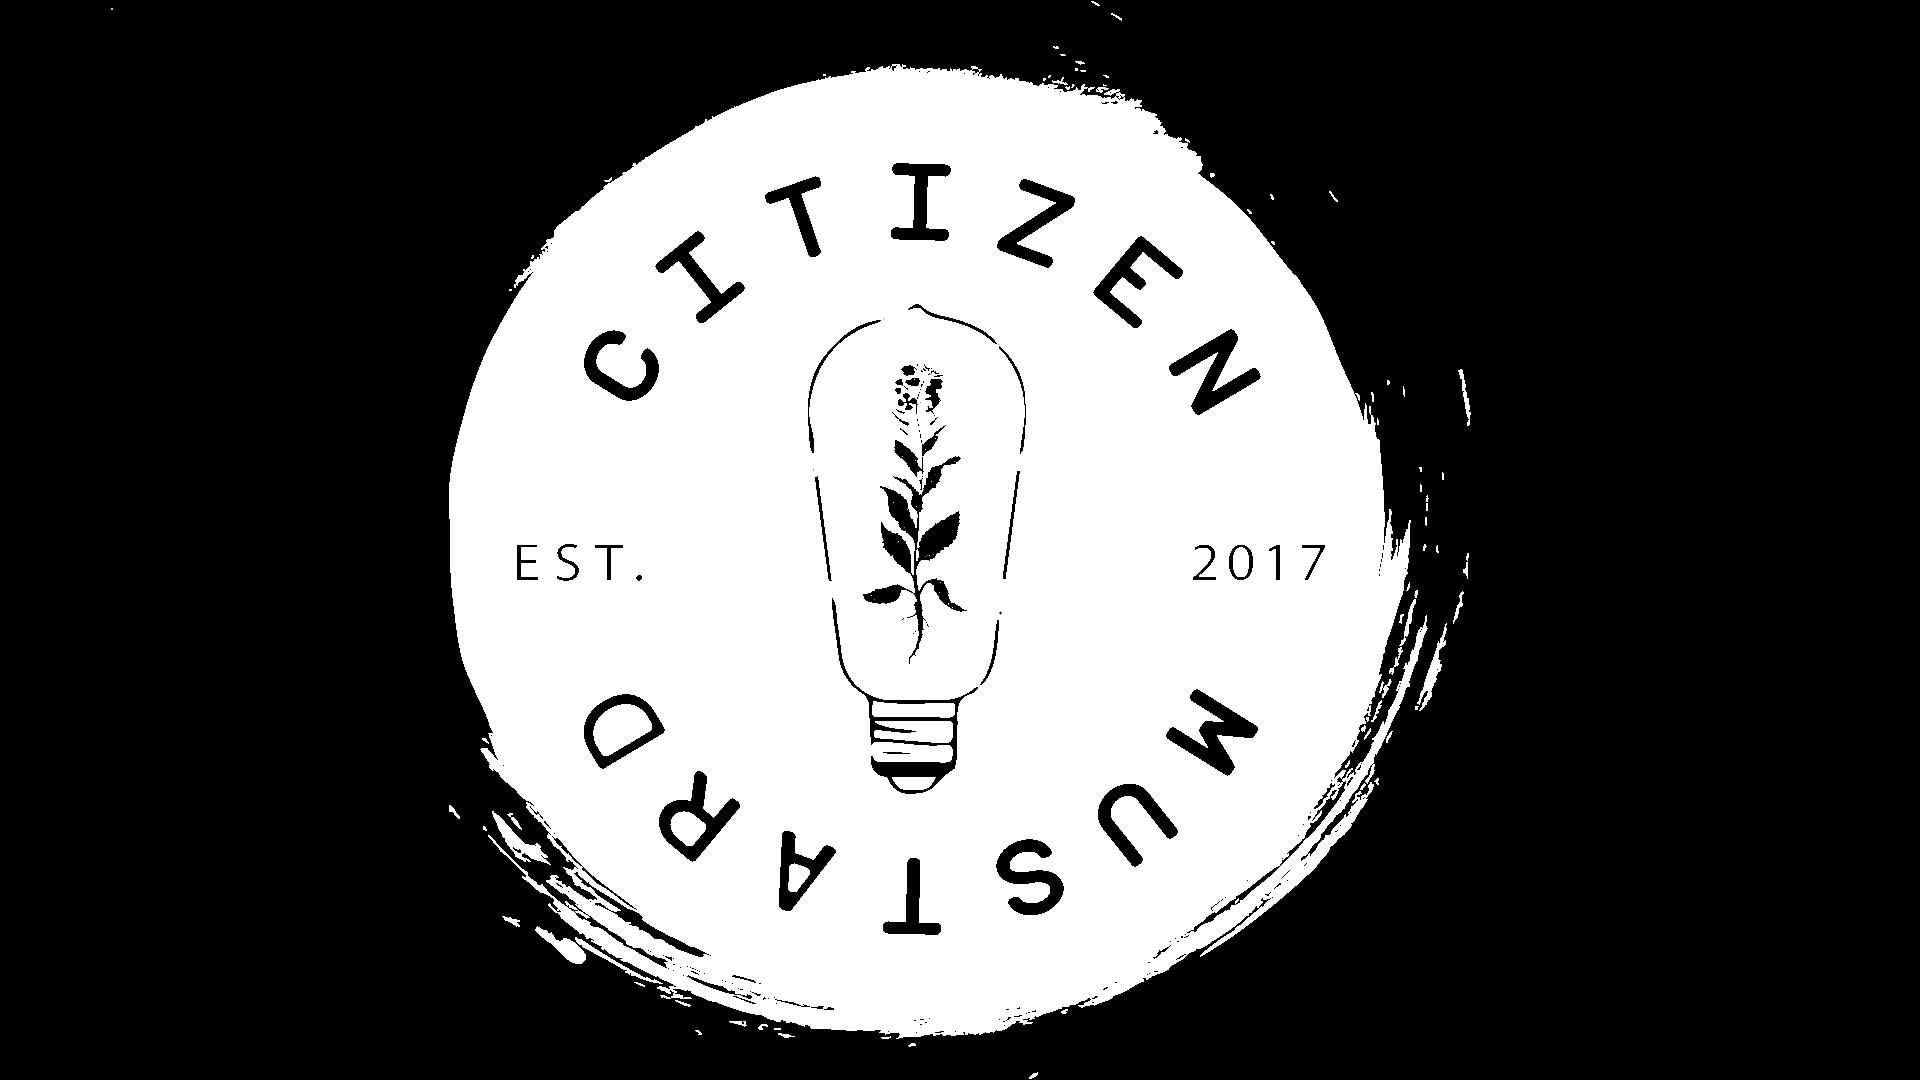 citizen_mustard_final_logo_bottle_rings_wht.png